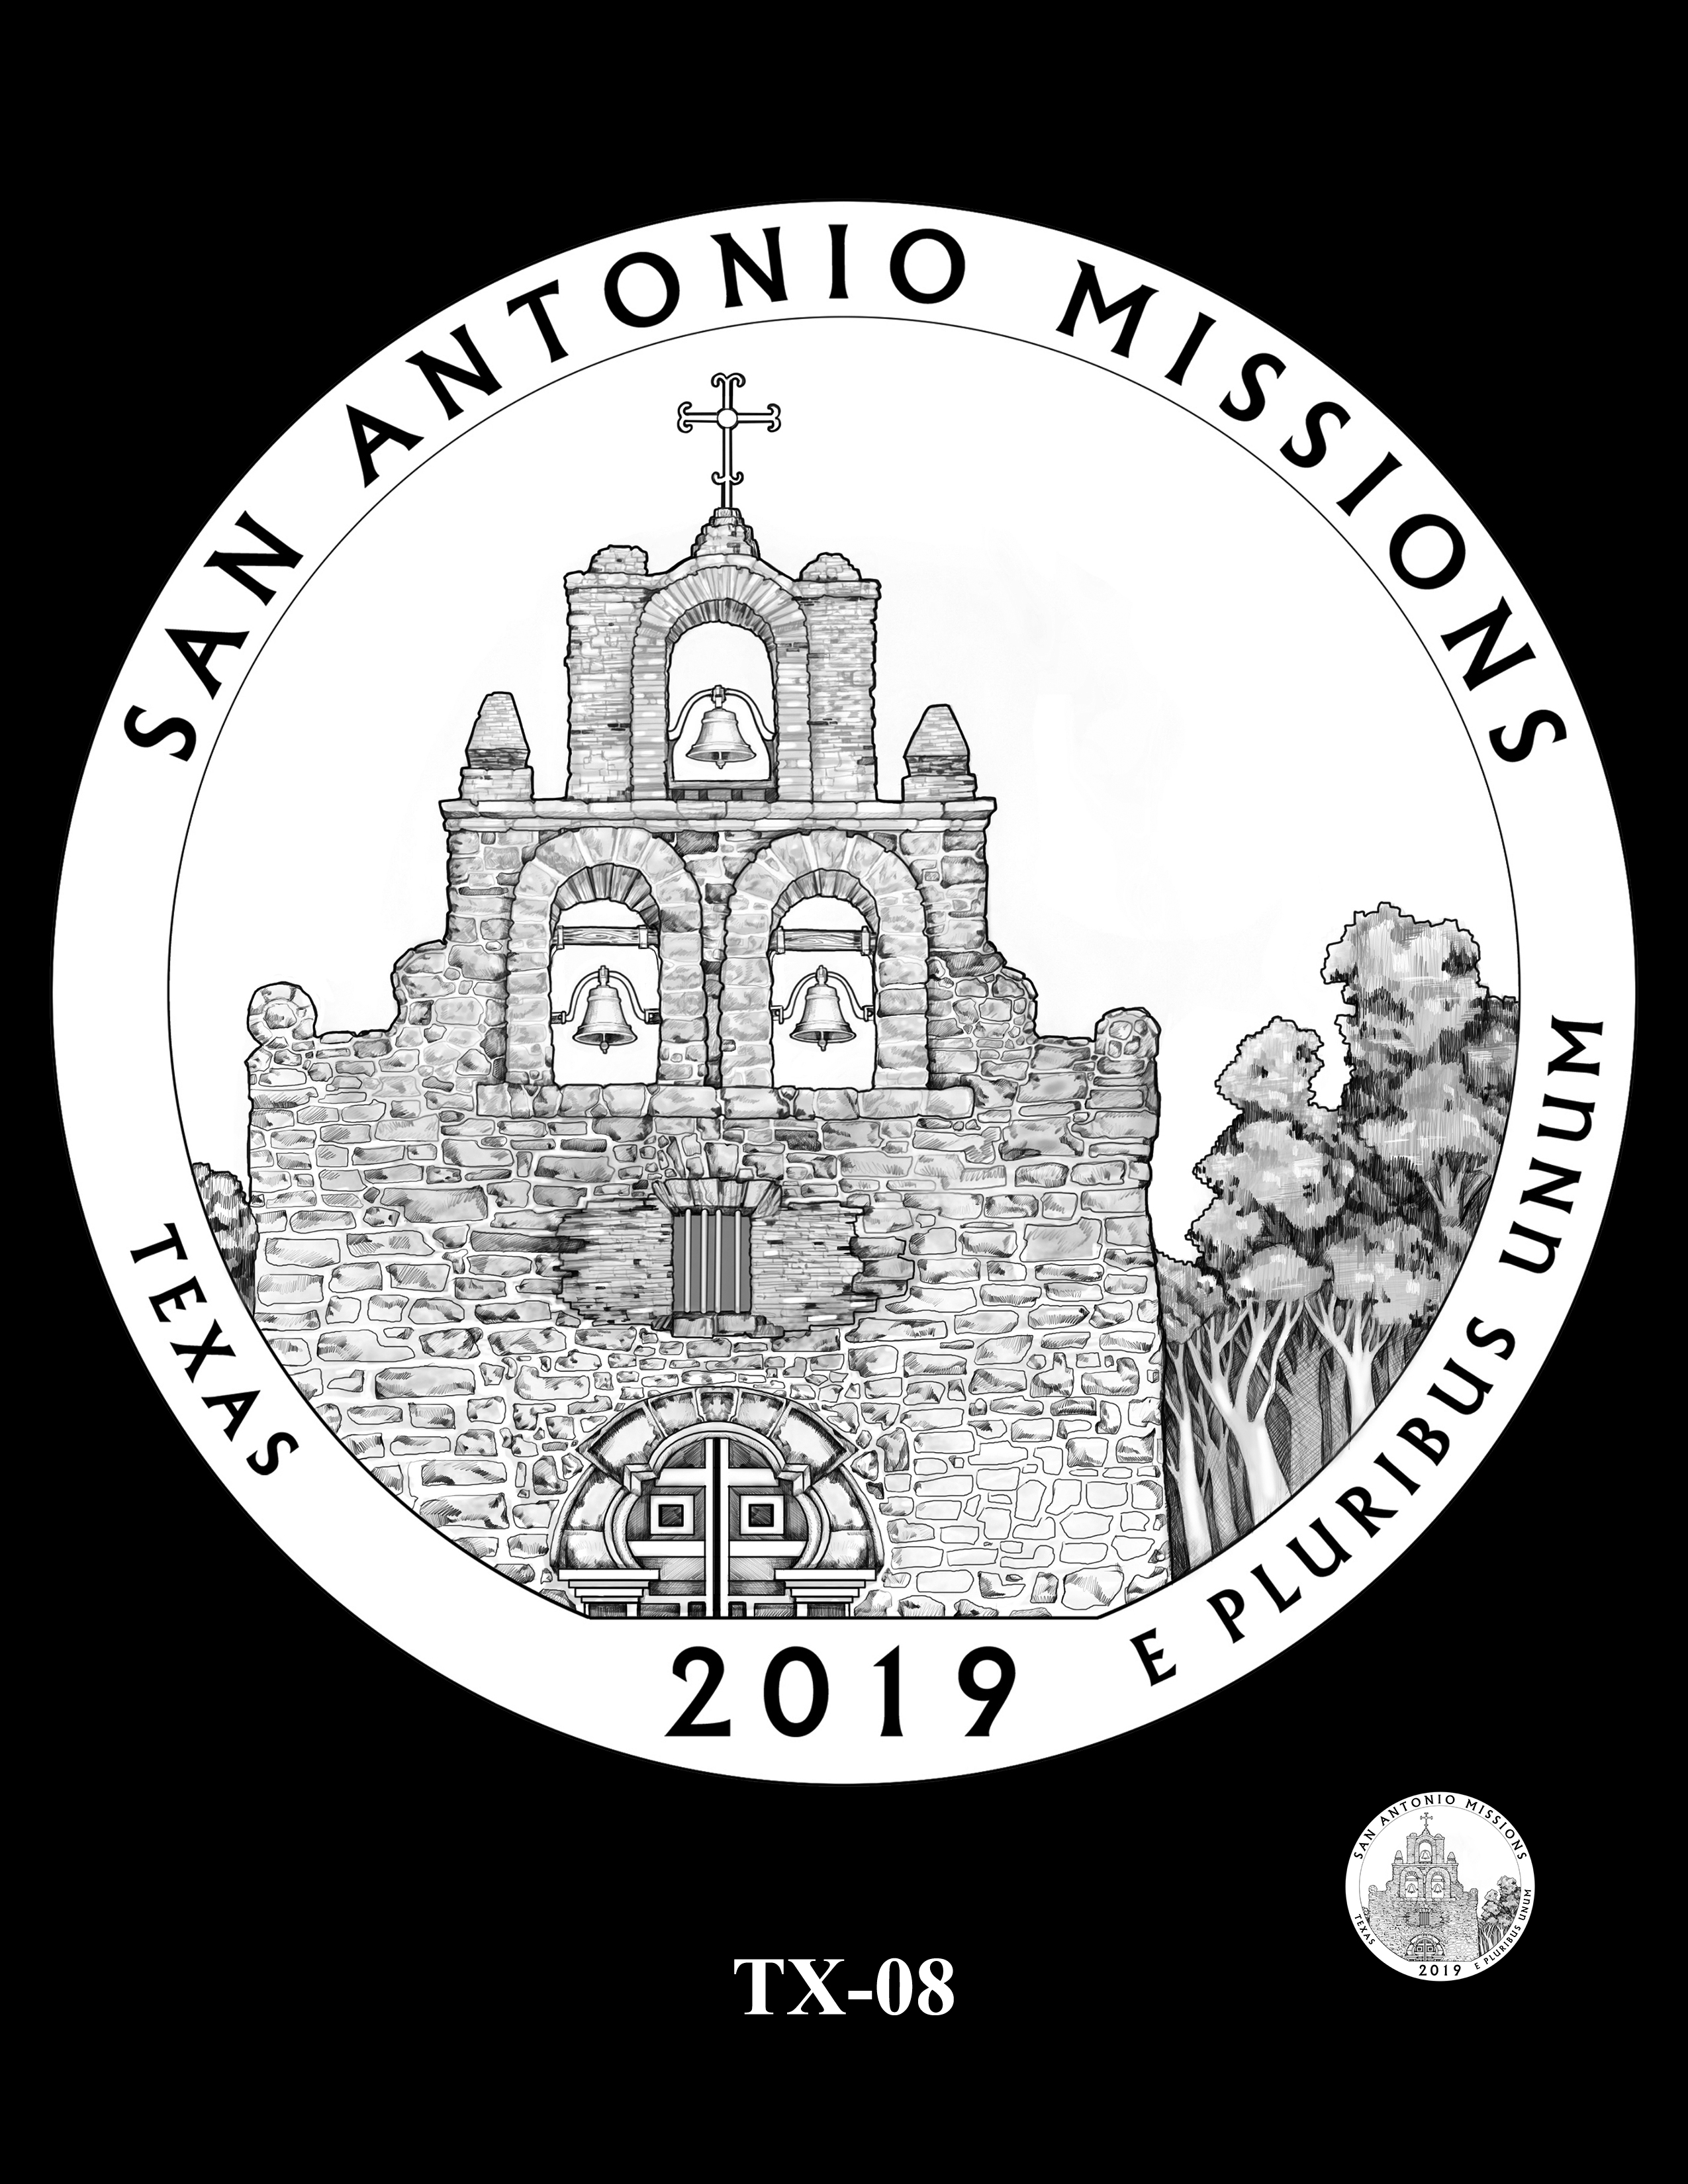 TX-08 -- 2019 America the Beautiful Quarters® Program